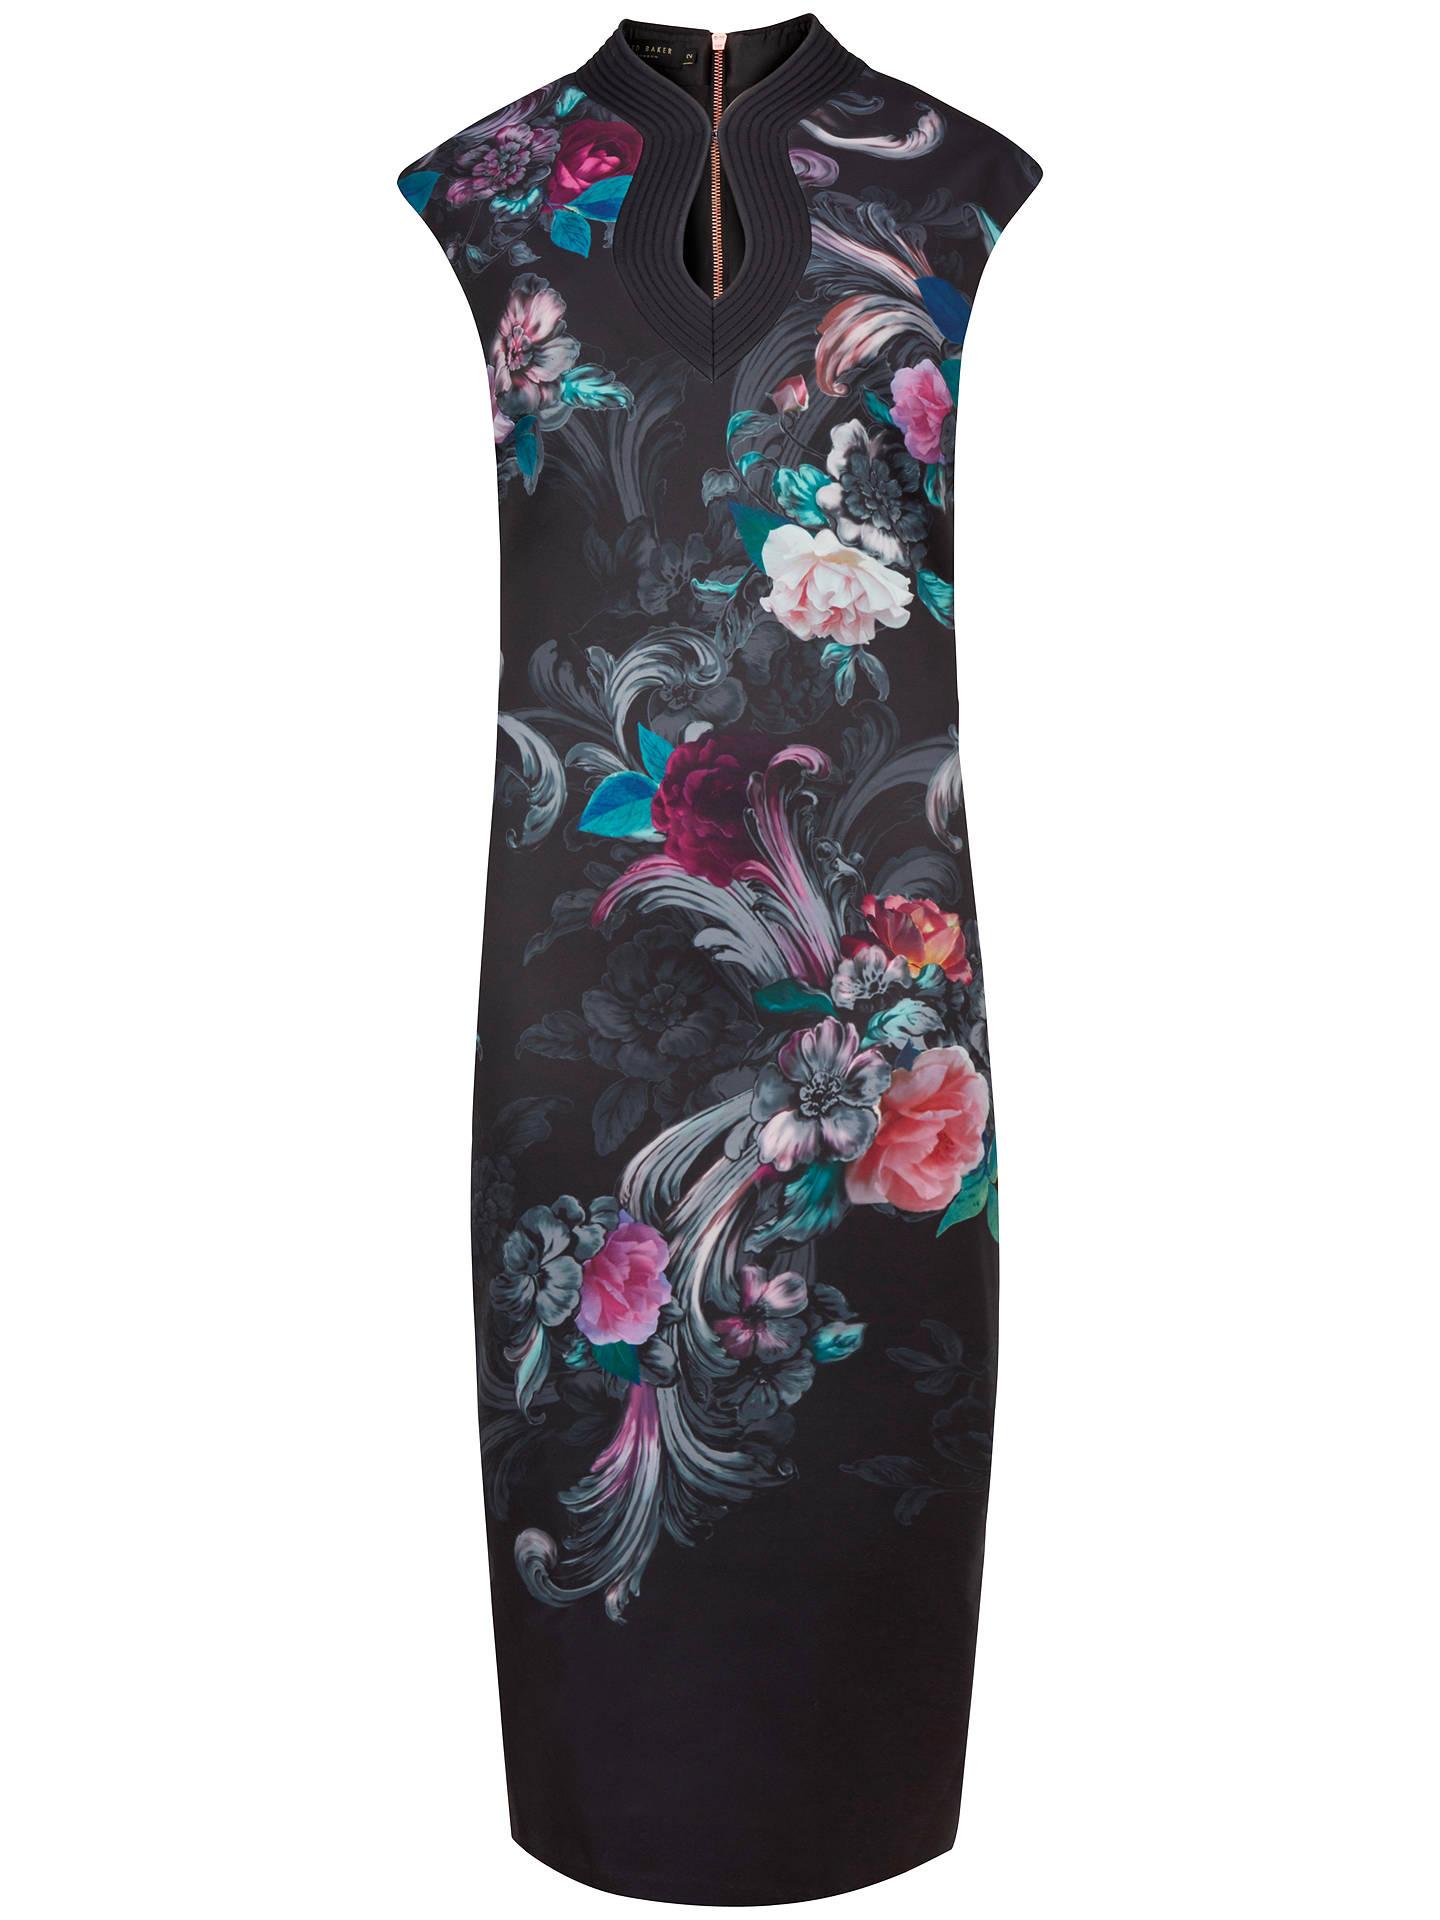 89a7677da028 Buy Ted Baker Marcela Acanthus Scroll Print Dress